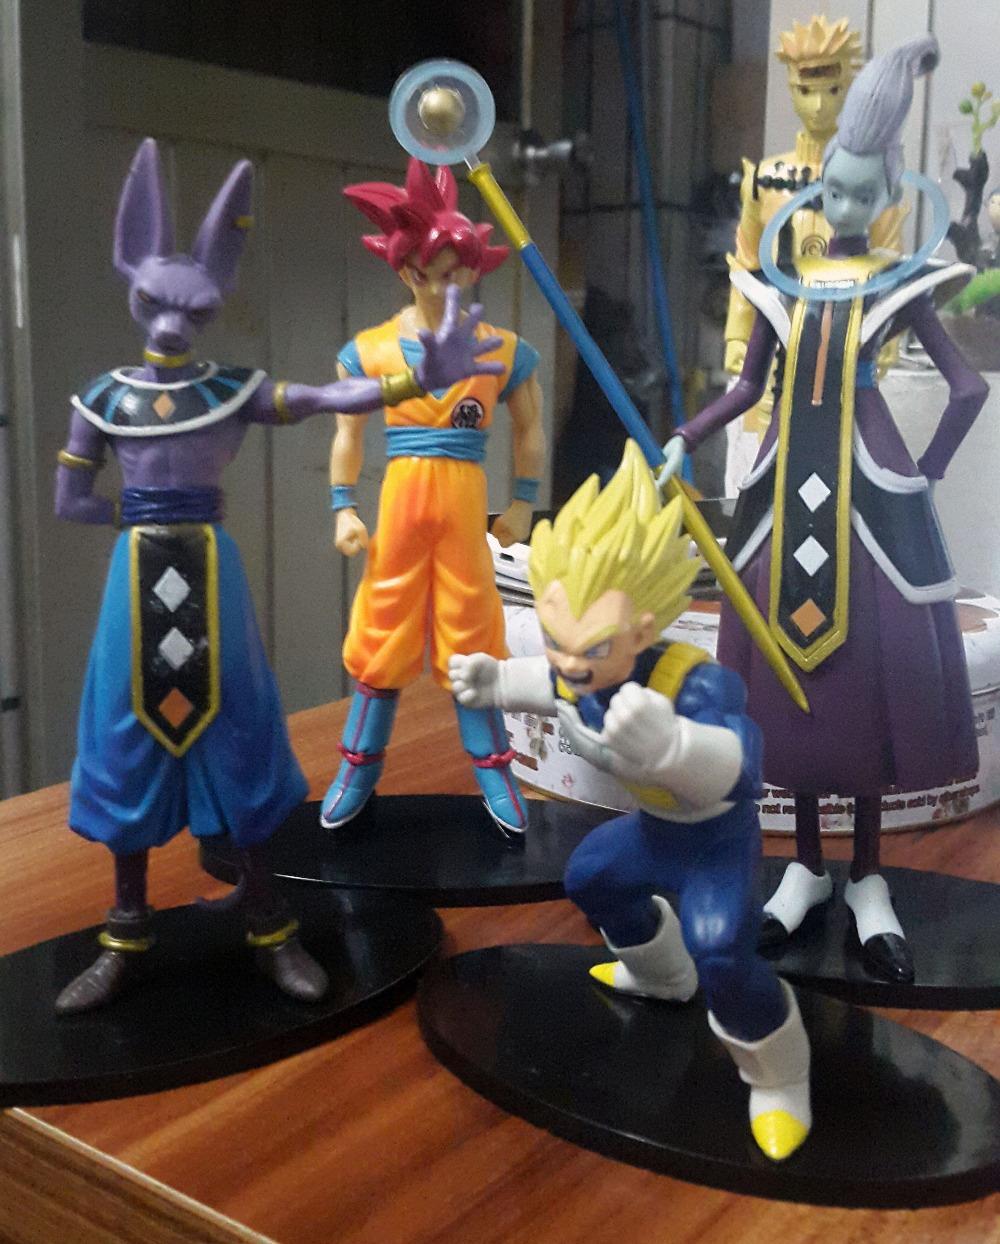 NEW Hot 4pcs/set 13-20cm Dragon Ball battle of gods Theater version Super Saiyan vegeta Son Goku Kakarotto Action Figure toys(China (Mainland))